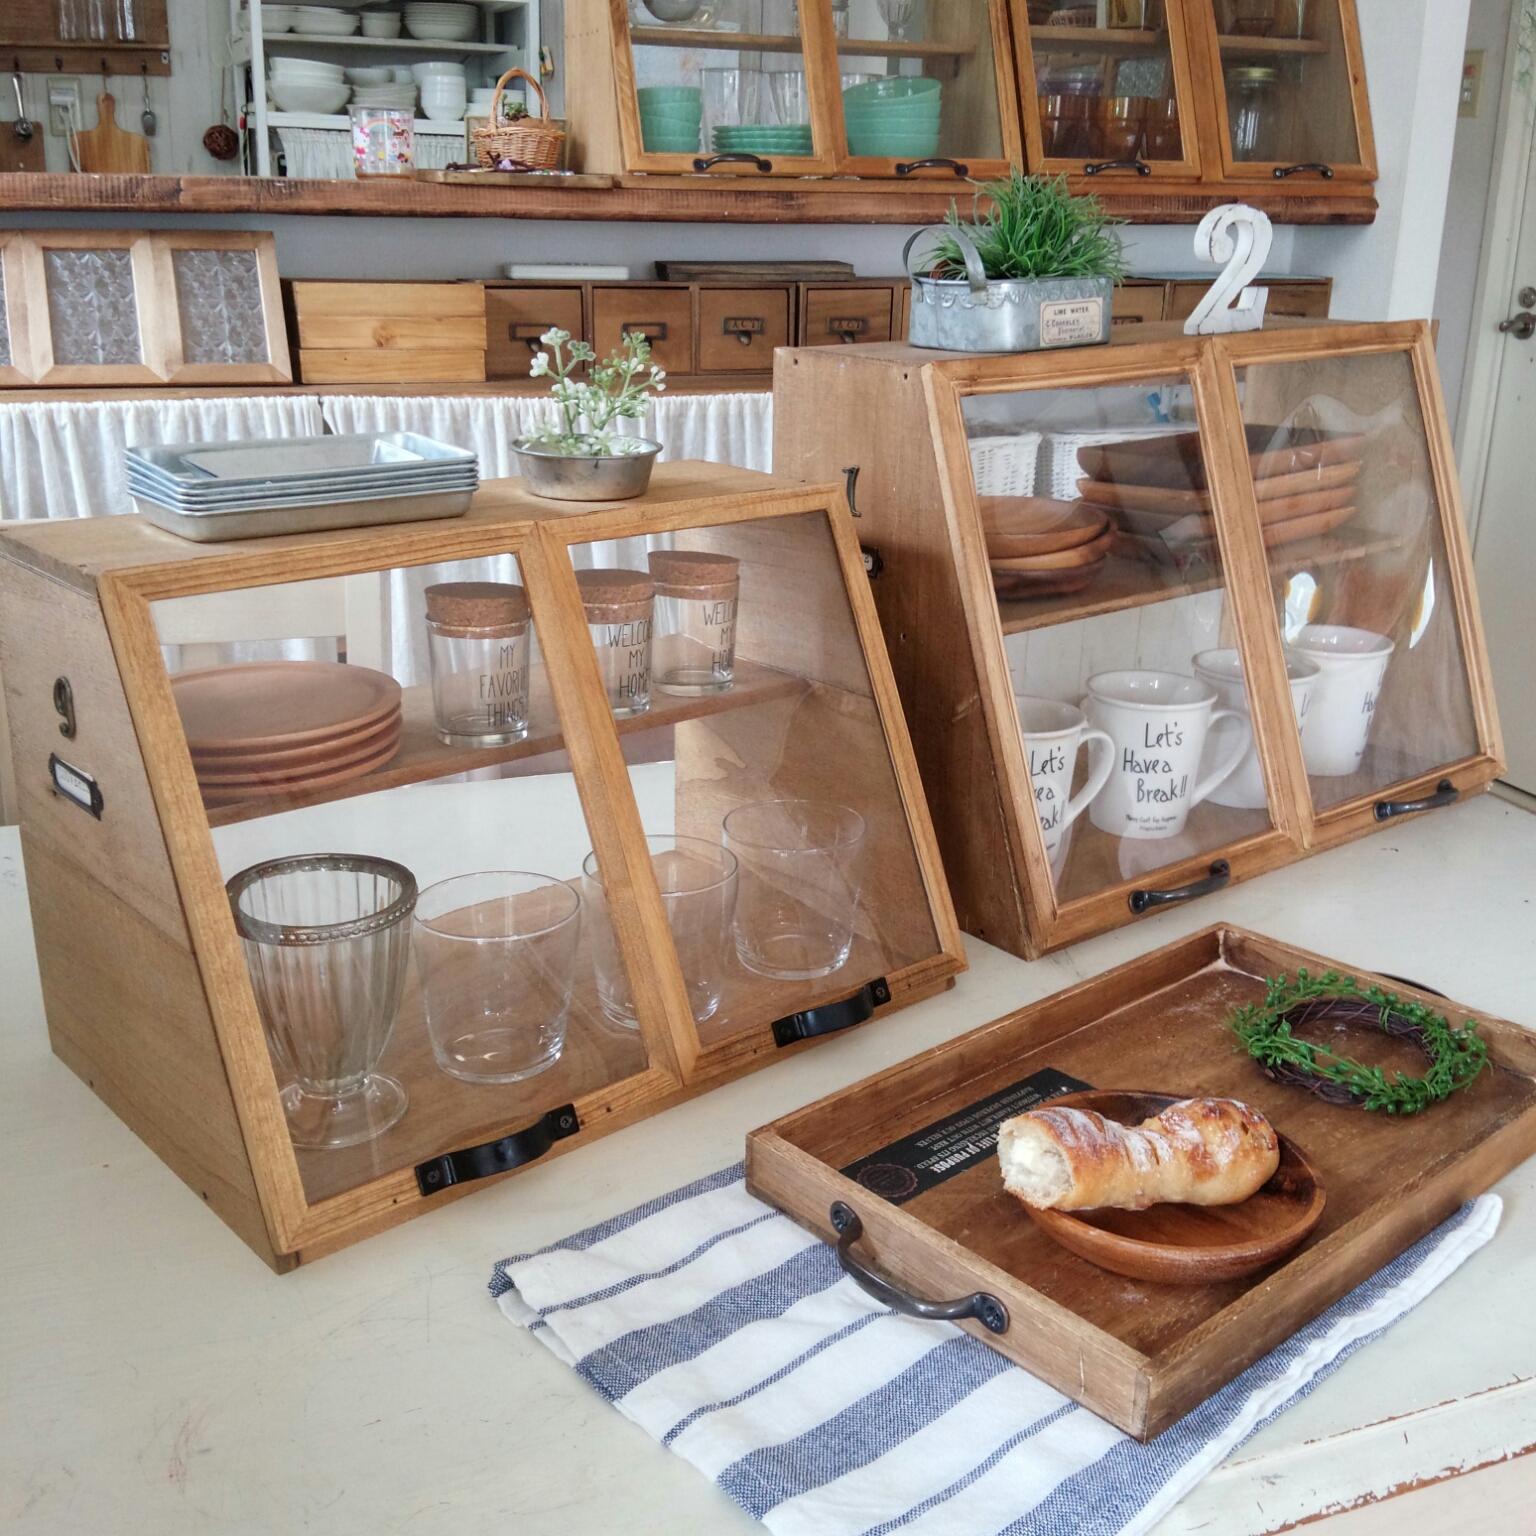 【DIY】オシャレな収納棚を安く手軽に手作りする【初心者向け】のサムネイル画像